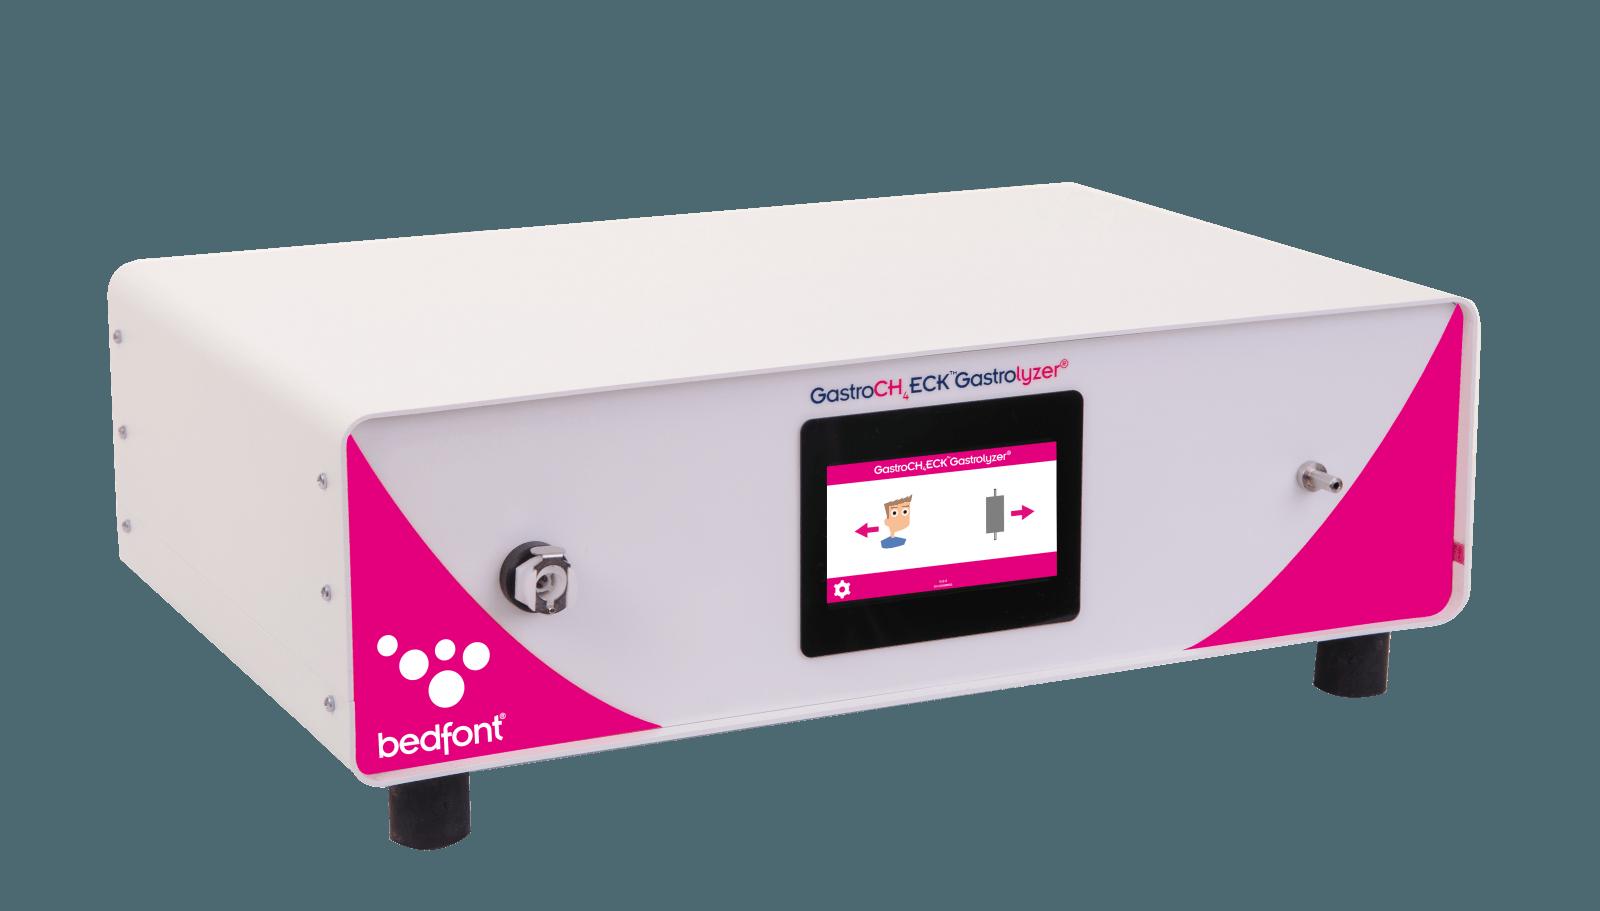 new gastrocheck monitor